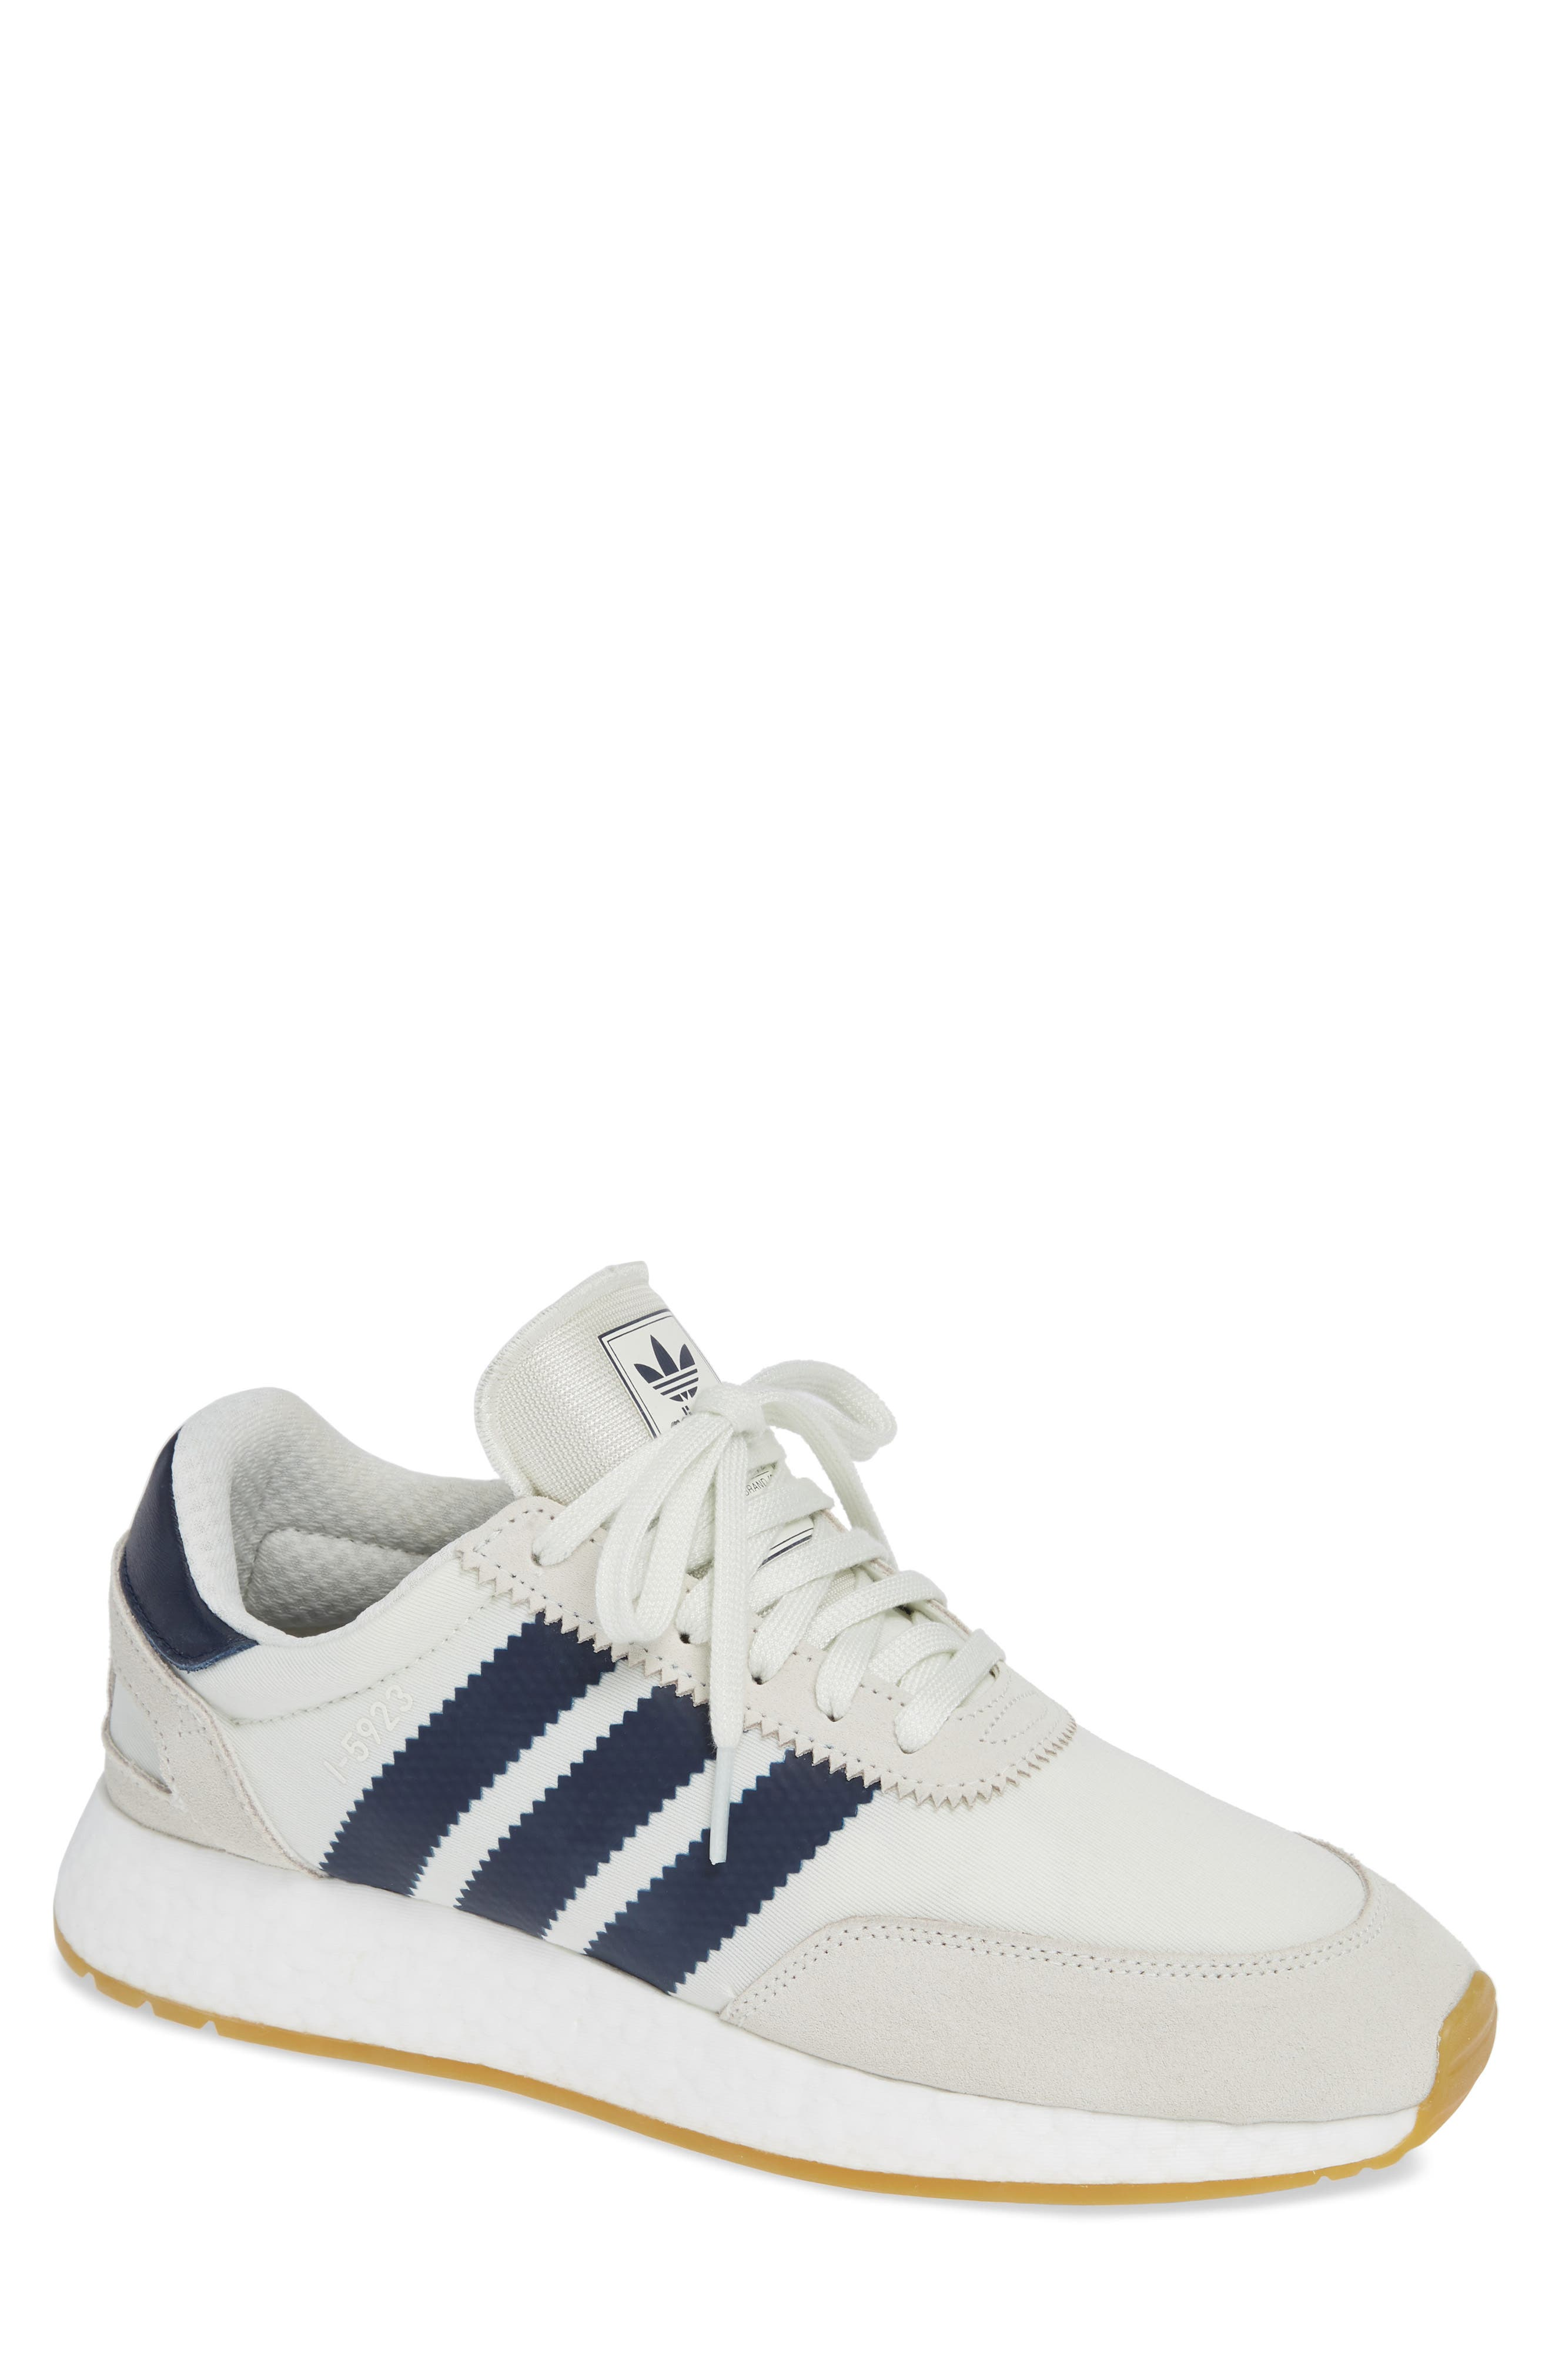 I-5923 Sneaker,                         Main,                         color, White/ Grey/ Gum